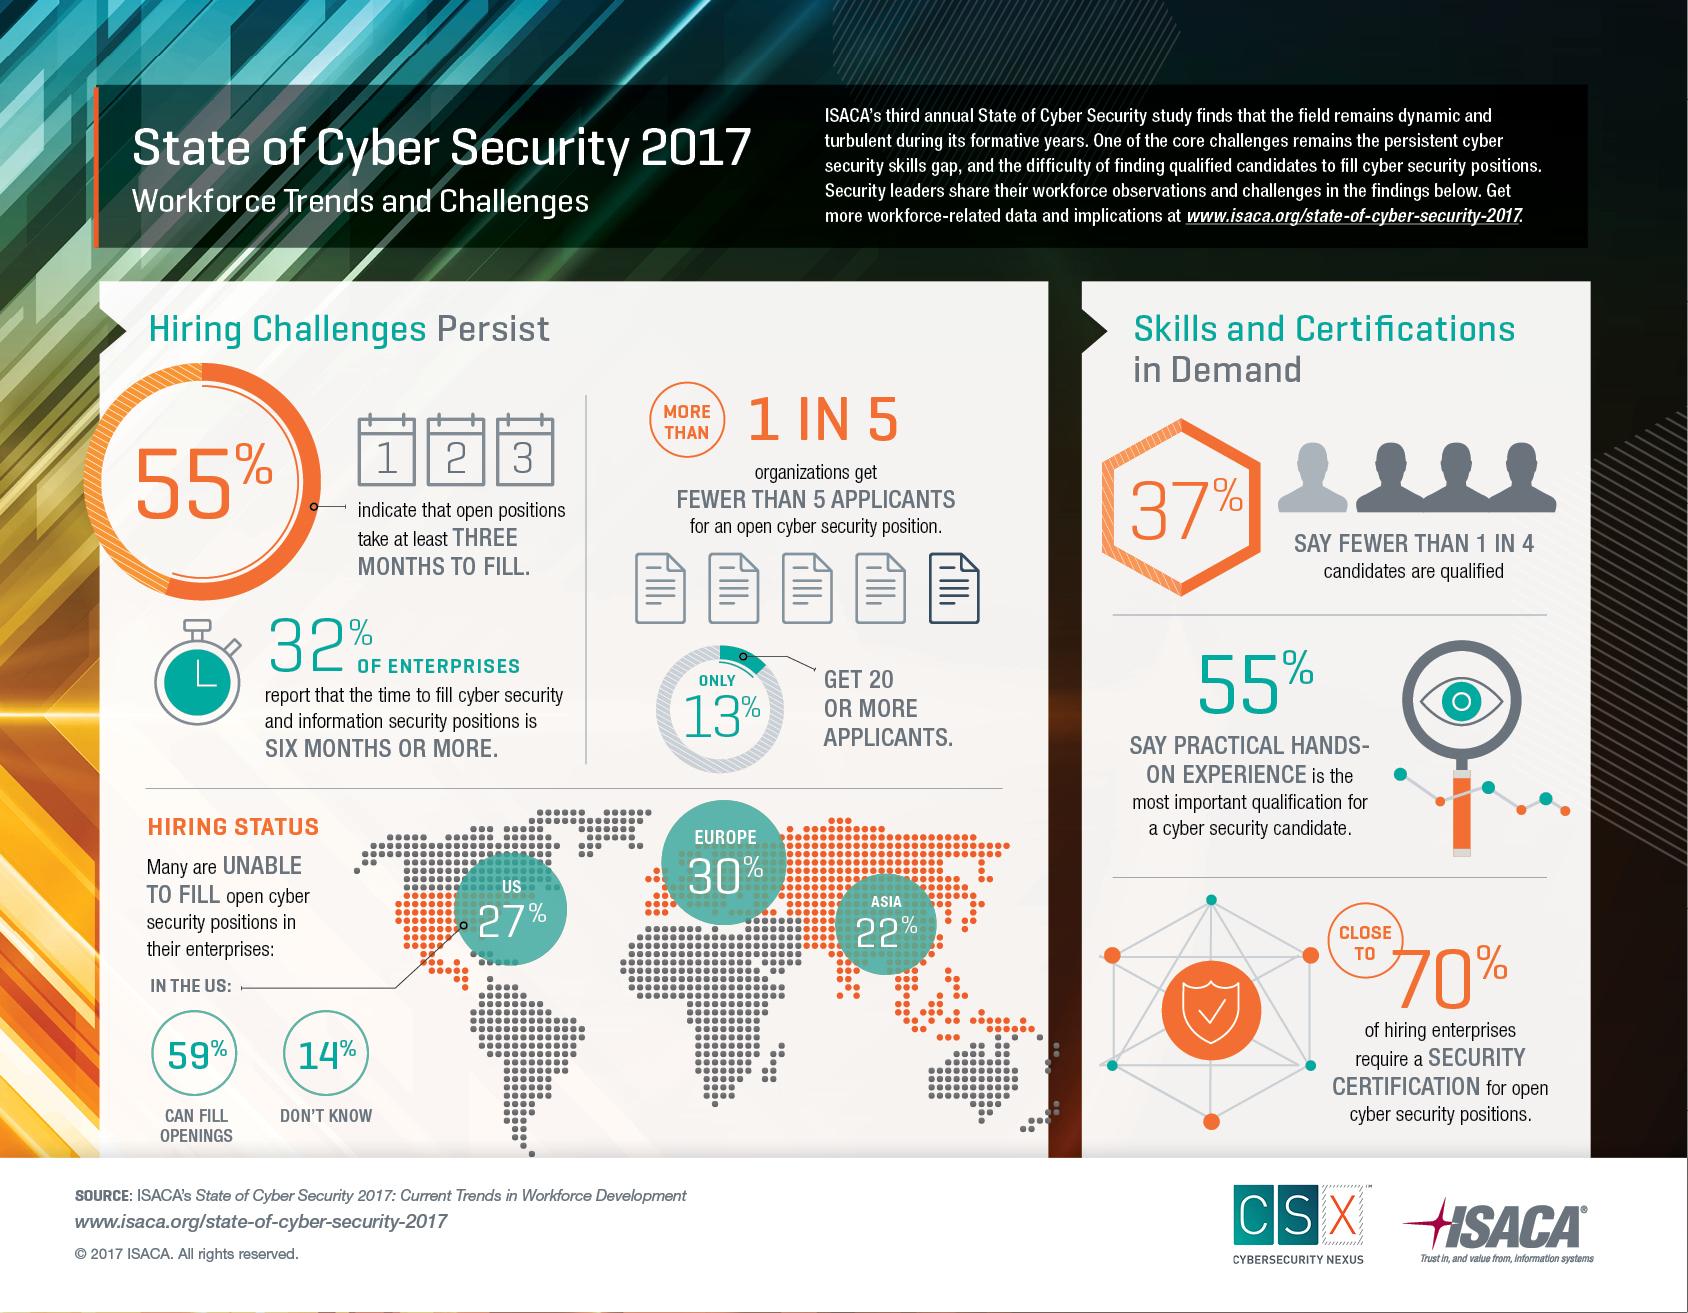 Isaca Survey Cyber Security Skills Gap Leaves 1 In 4 Organizations